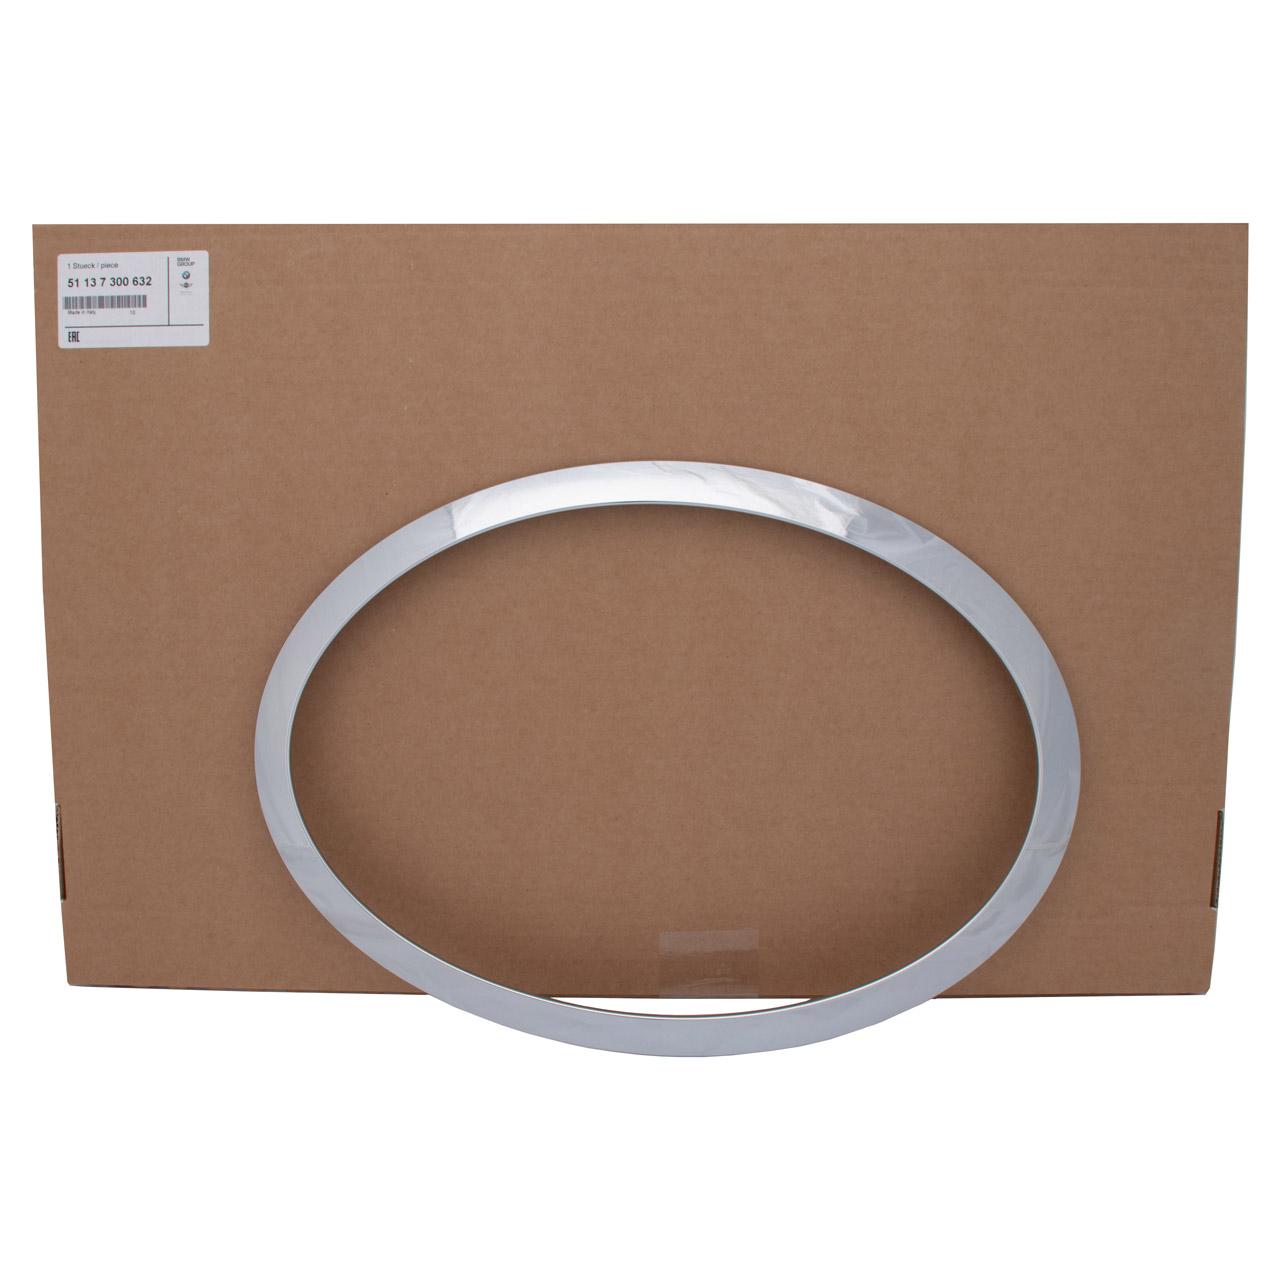 ORIGINAL Mini Zierring Ring Scheinwerfer CHROM F55 F56 F57 rechts 51137300632